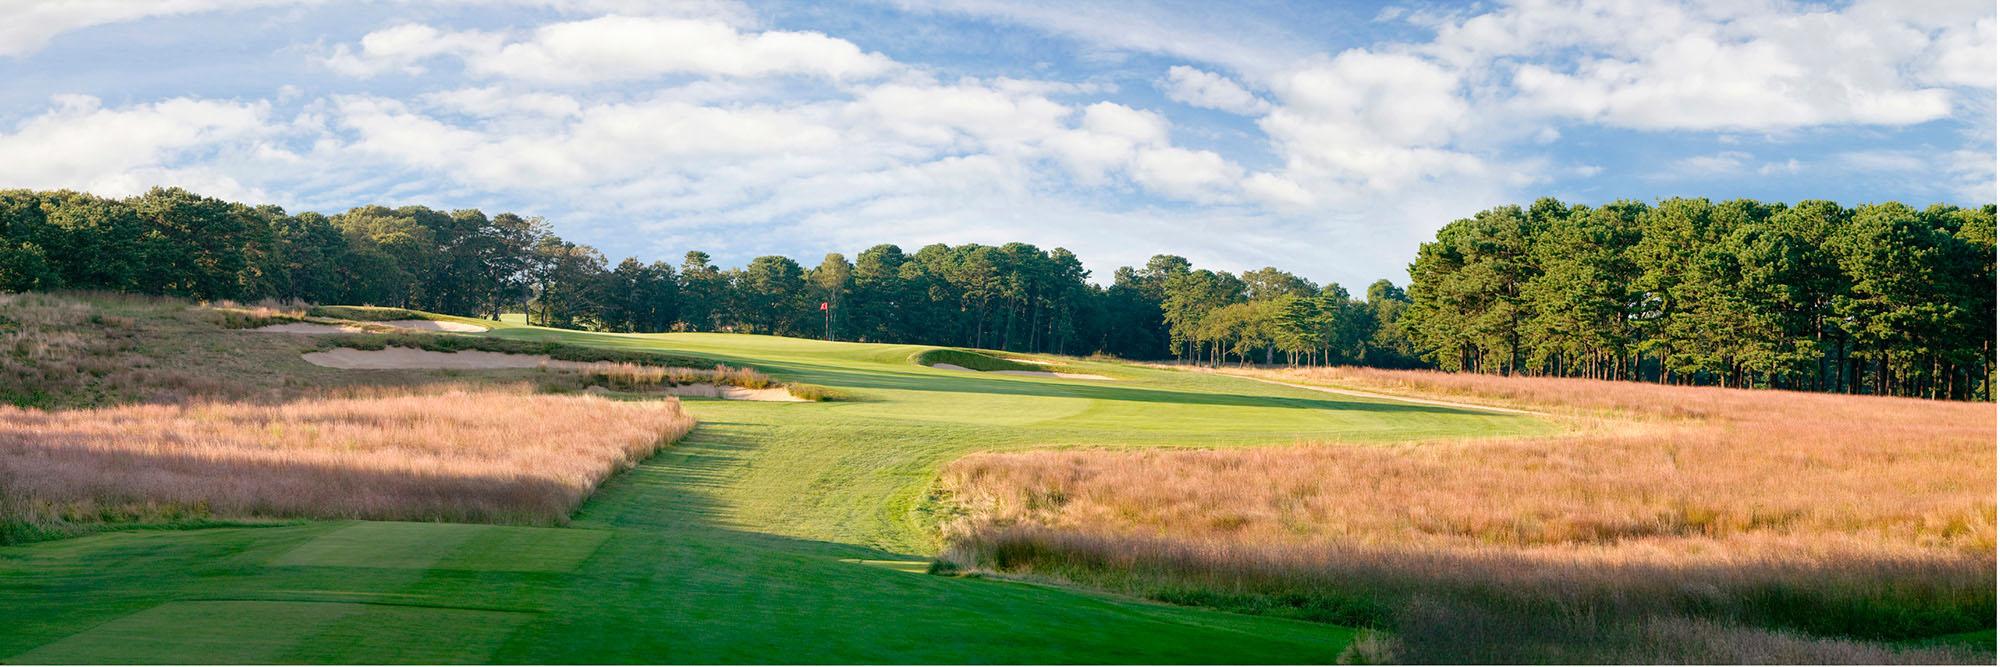 Golf Course Image - Shinnecock Hills Golf Club No. 2